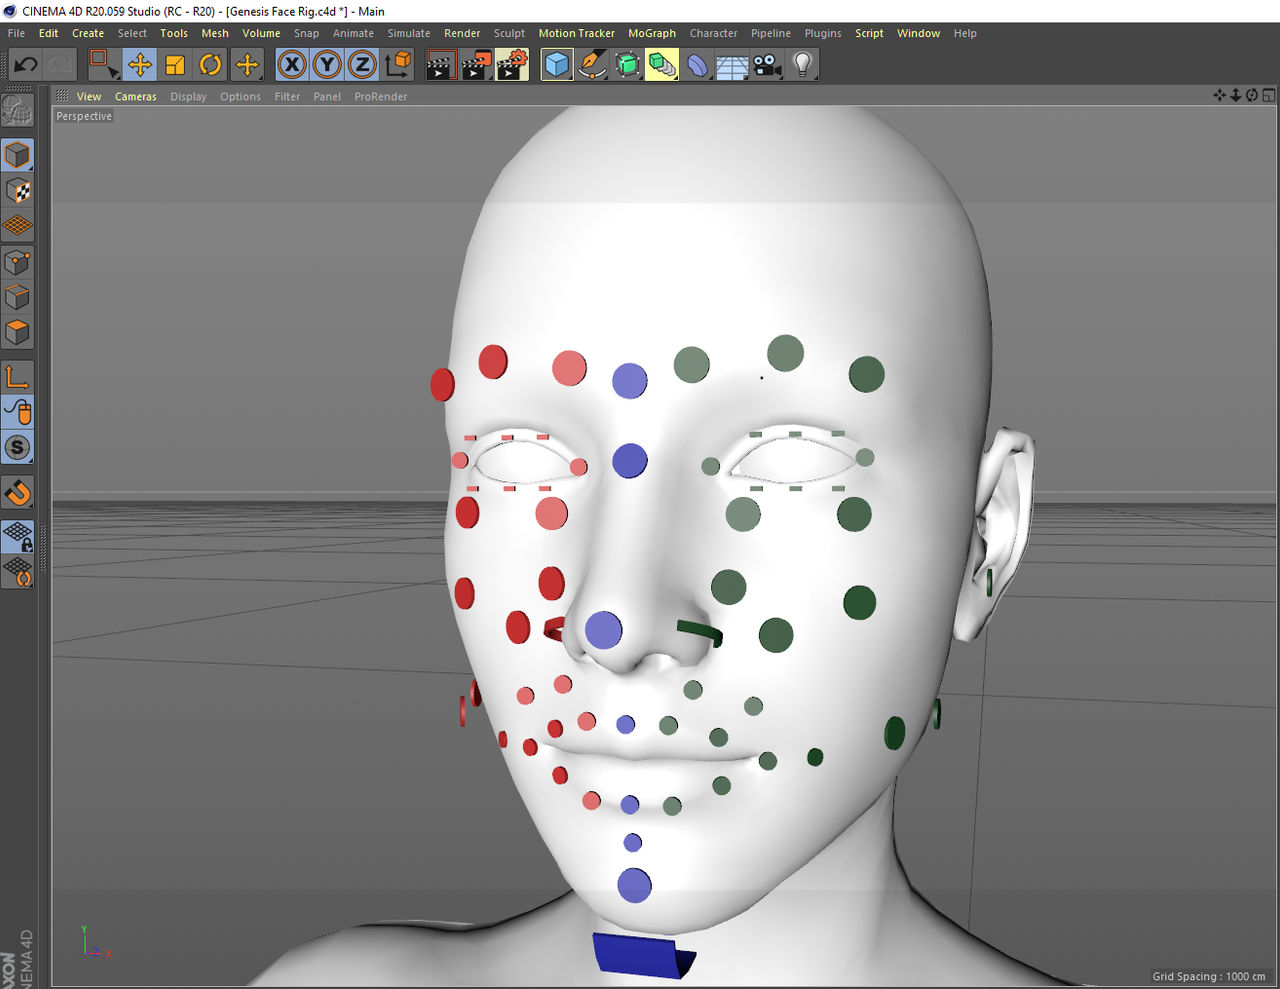 Genesis 8 Face rig